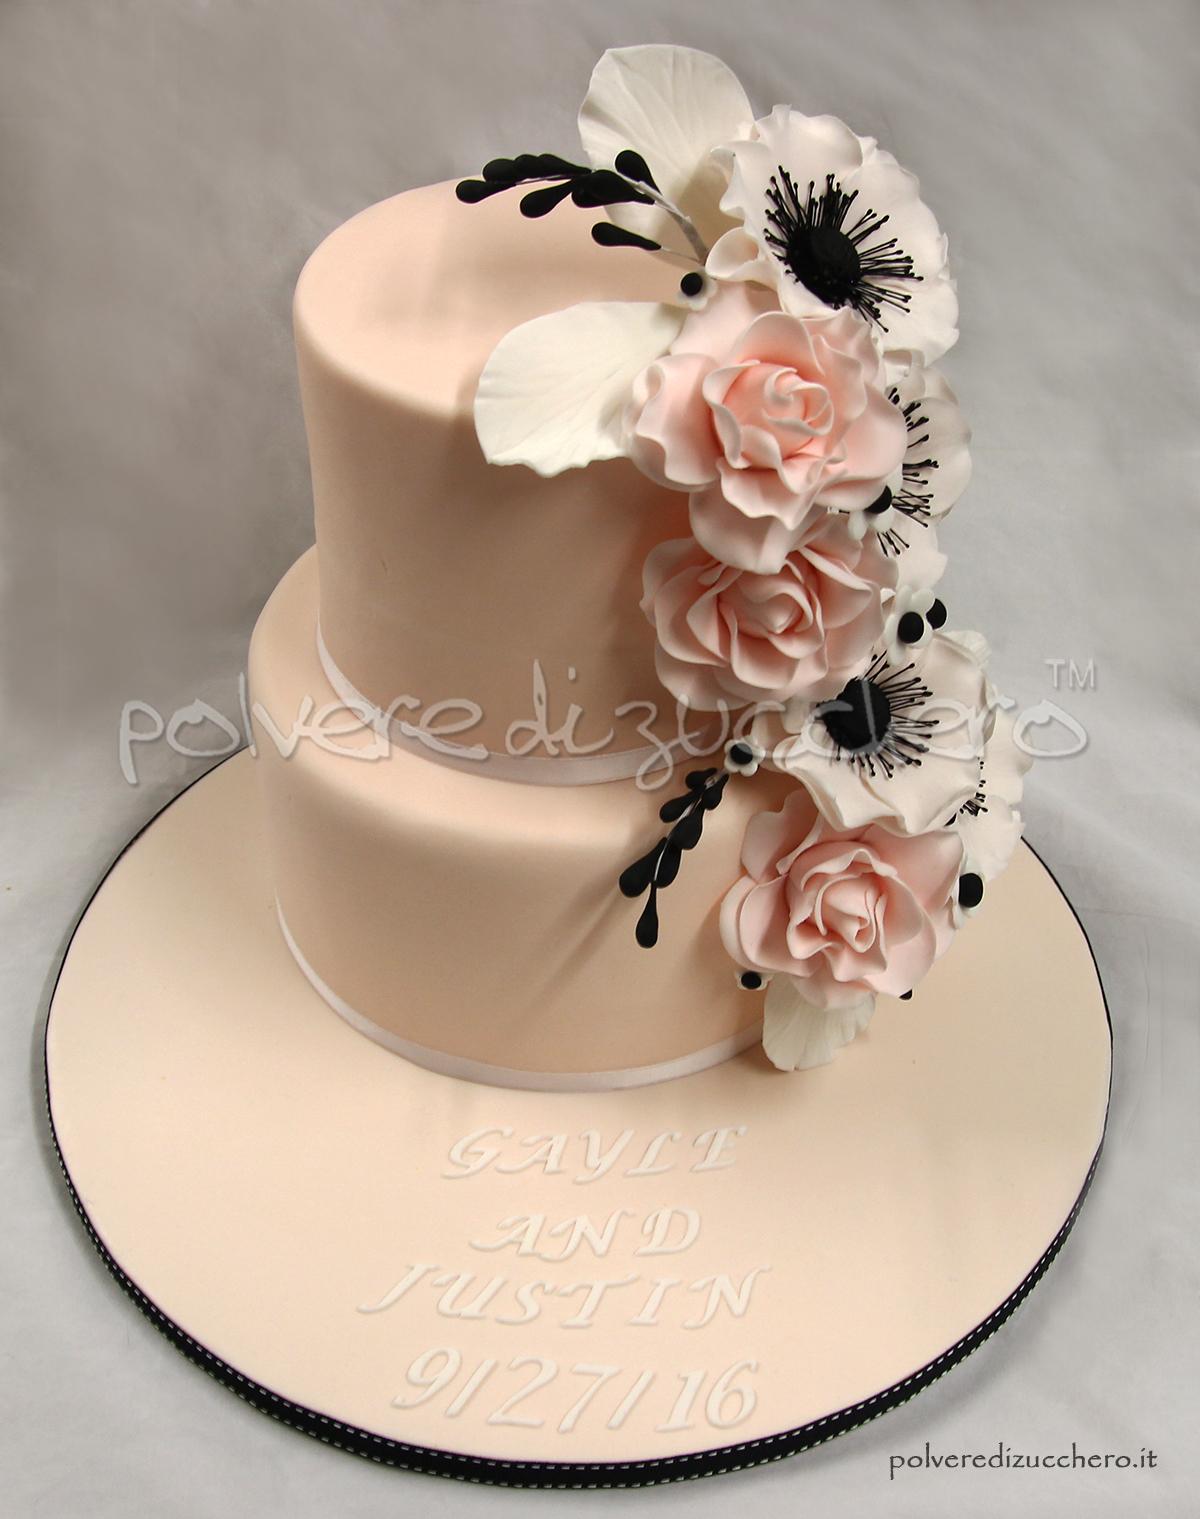 Cake Design Ricette Pasta Di Zucchero : Wedding cake: torta nuziale con rose ed anemoni in pasta ...